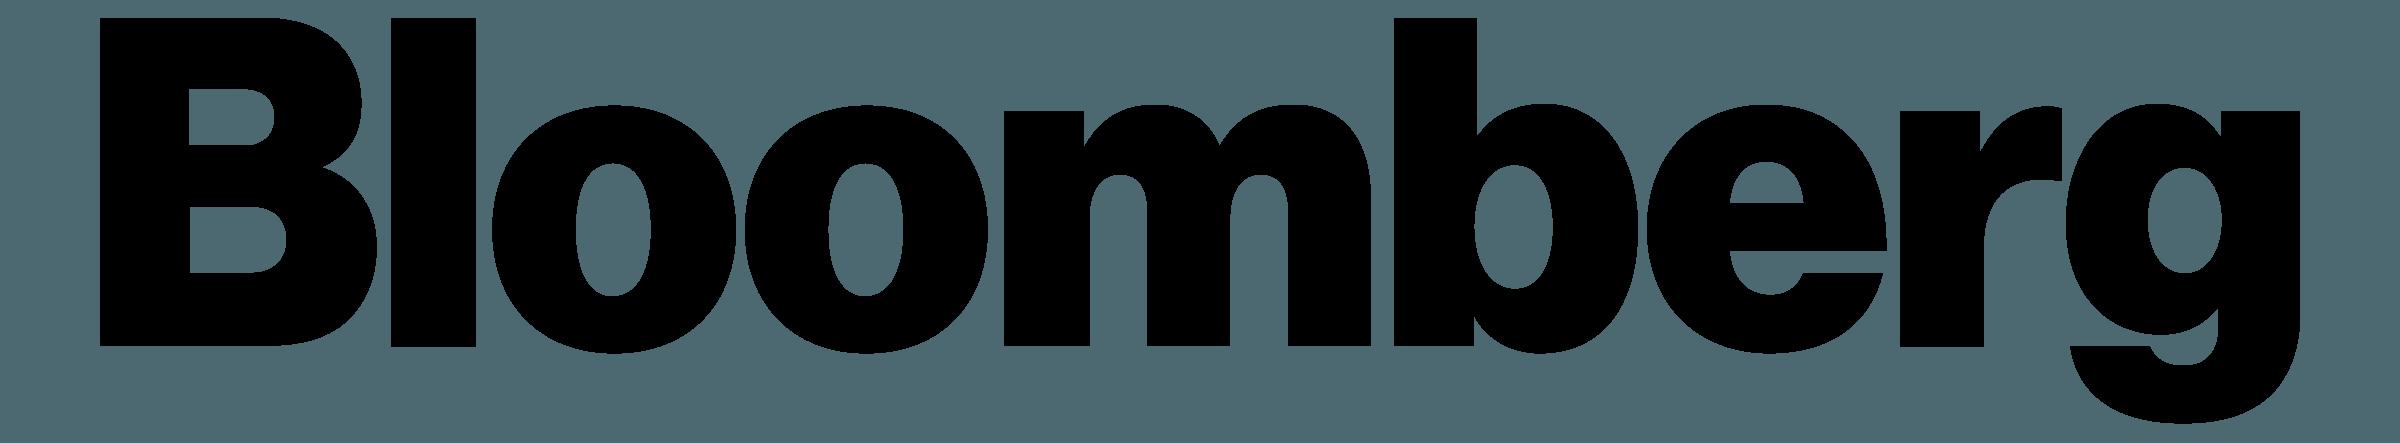 Bloomberg Logo PNG Transparent & SVG Vector - Freebie Supply